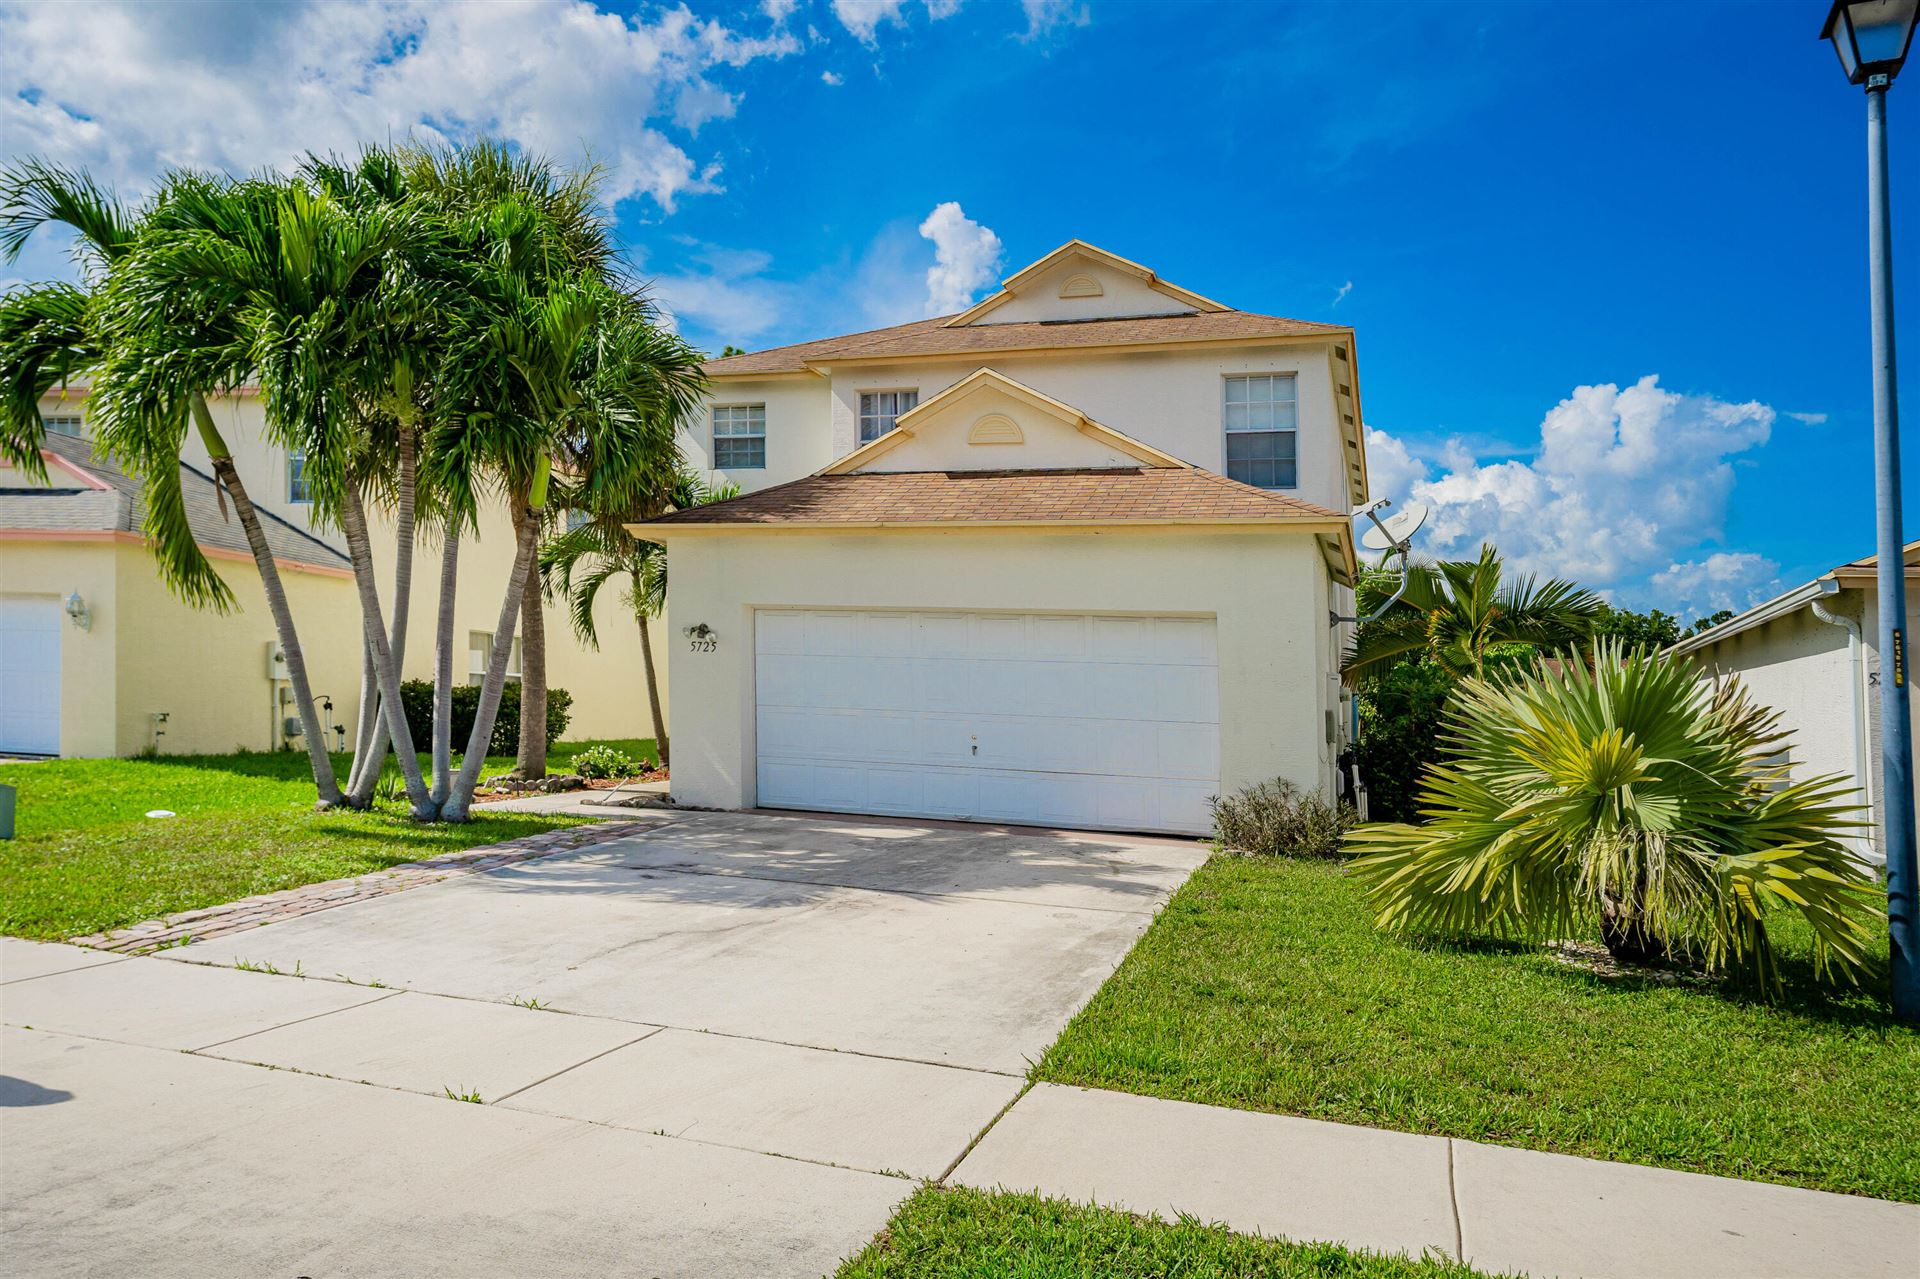 5725 Azalea Circle, West Palm Beach, FL 33415 - MLS#: RX-10746074